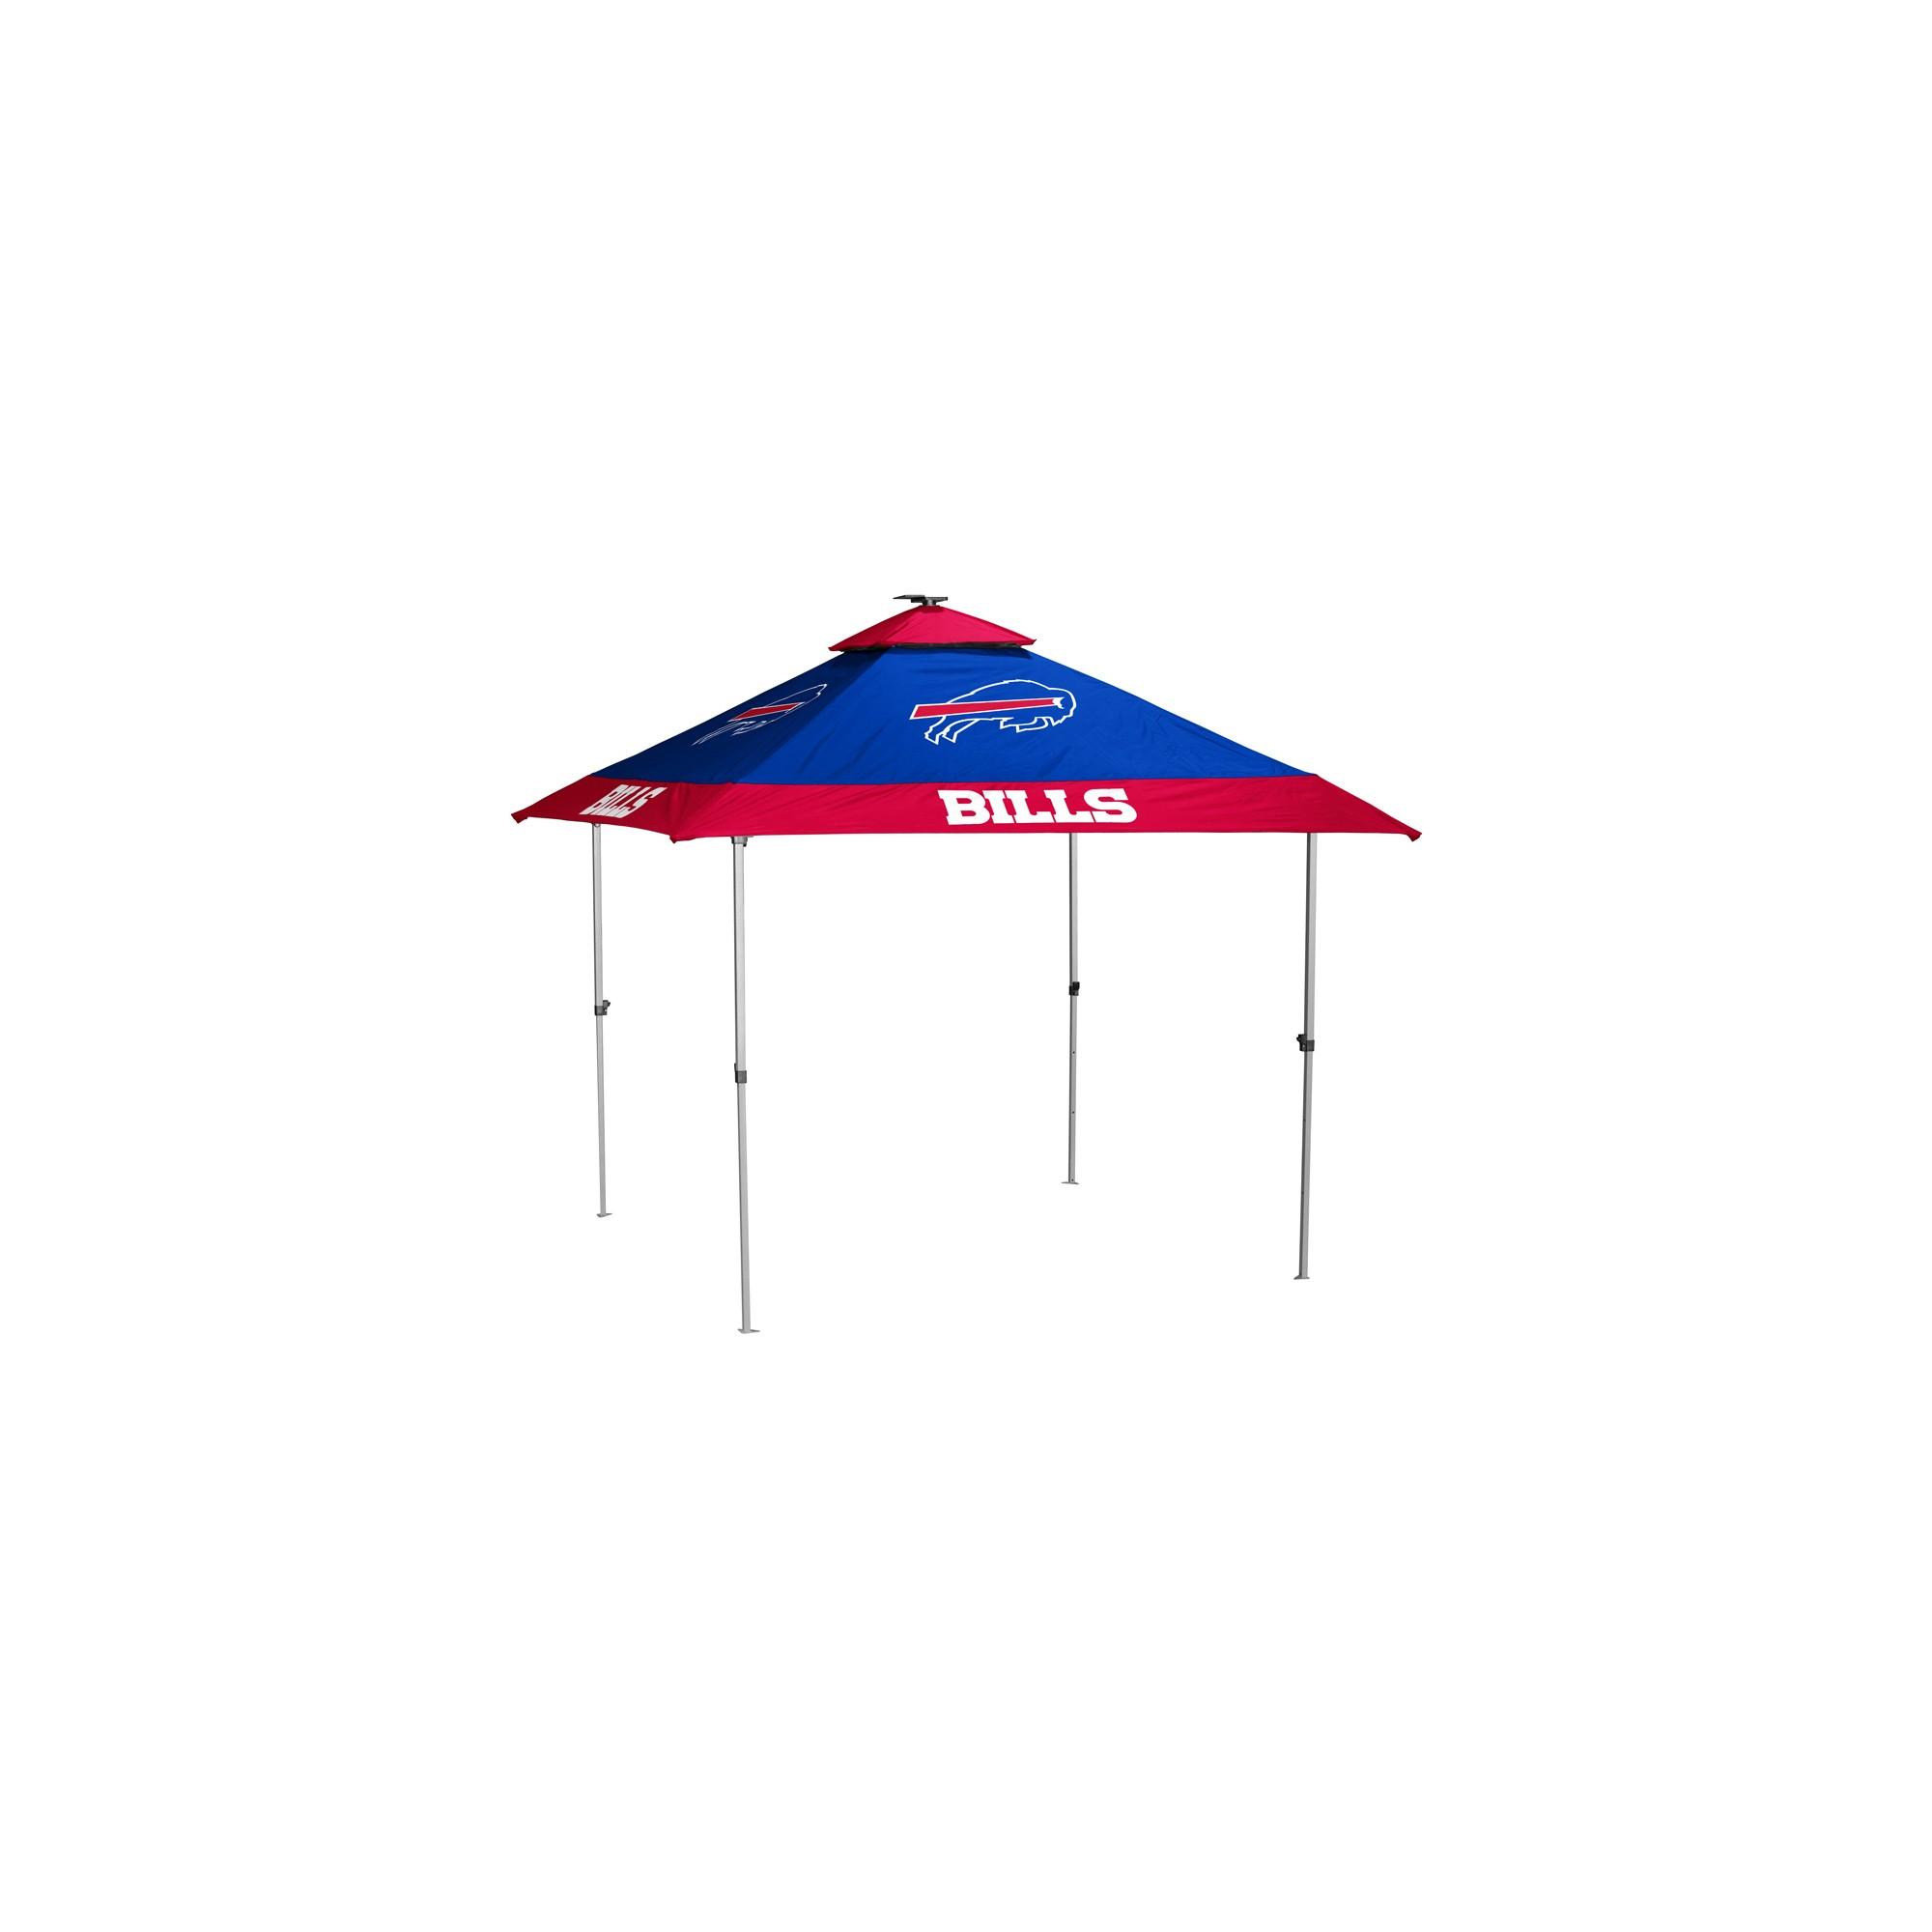 Nfl Buffalo Bills 10x10 Pagoda Canopy Tent Canopy Tent